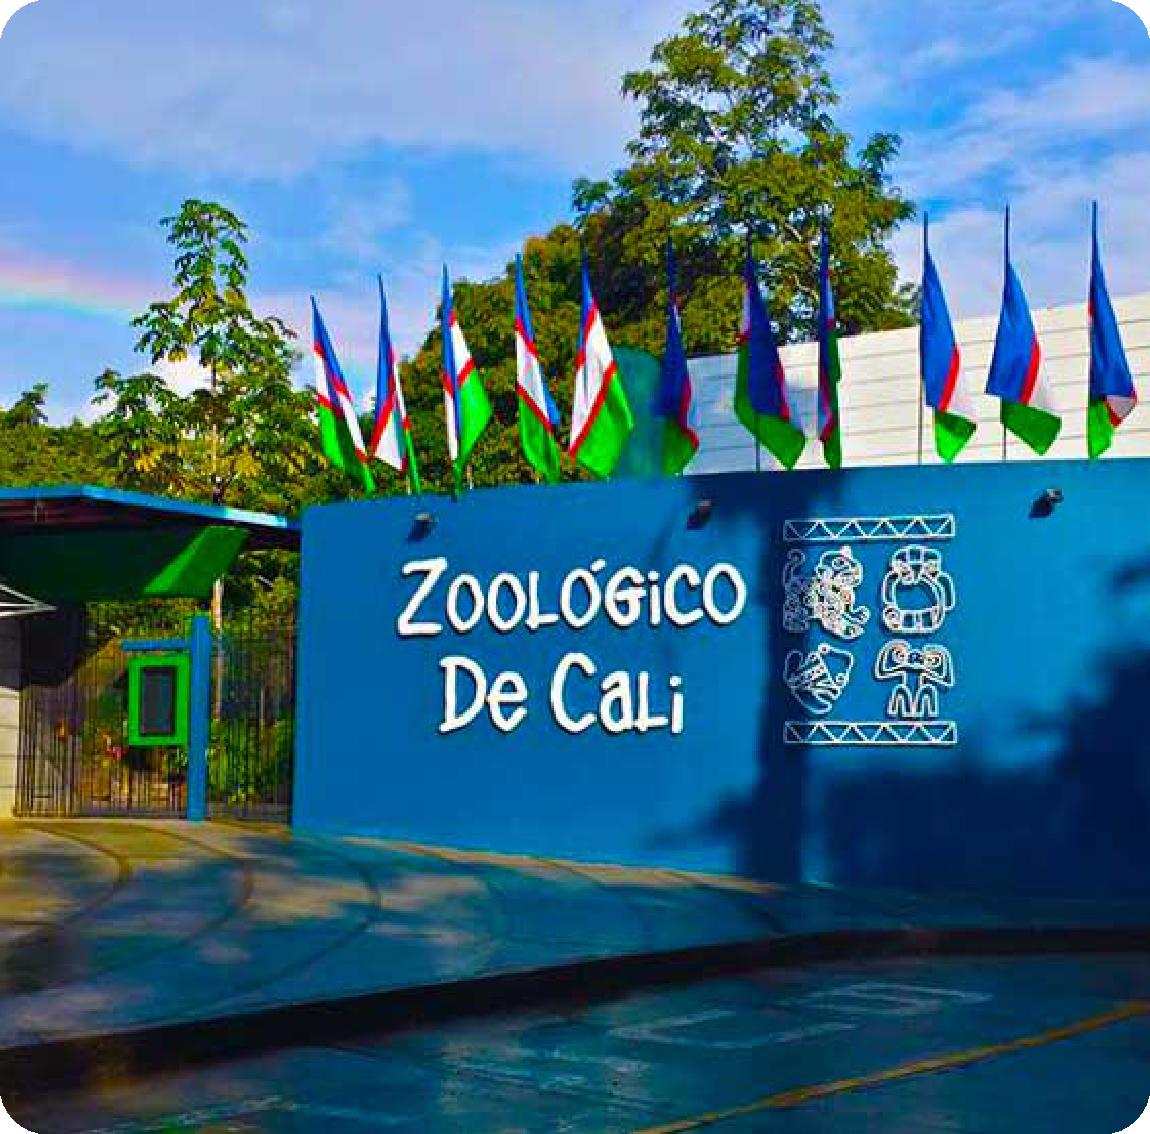 TURISMO-zoologico-cali-GUIA-EMPRENDER1